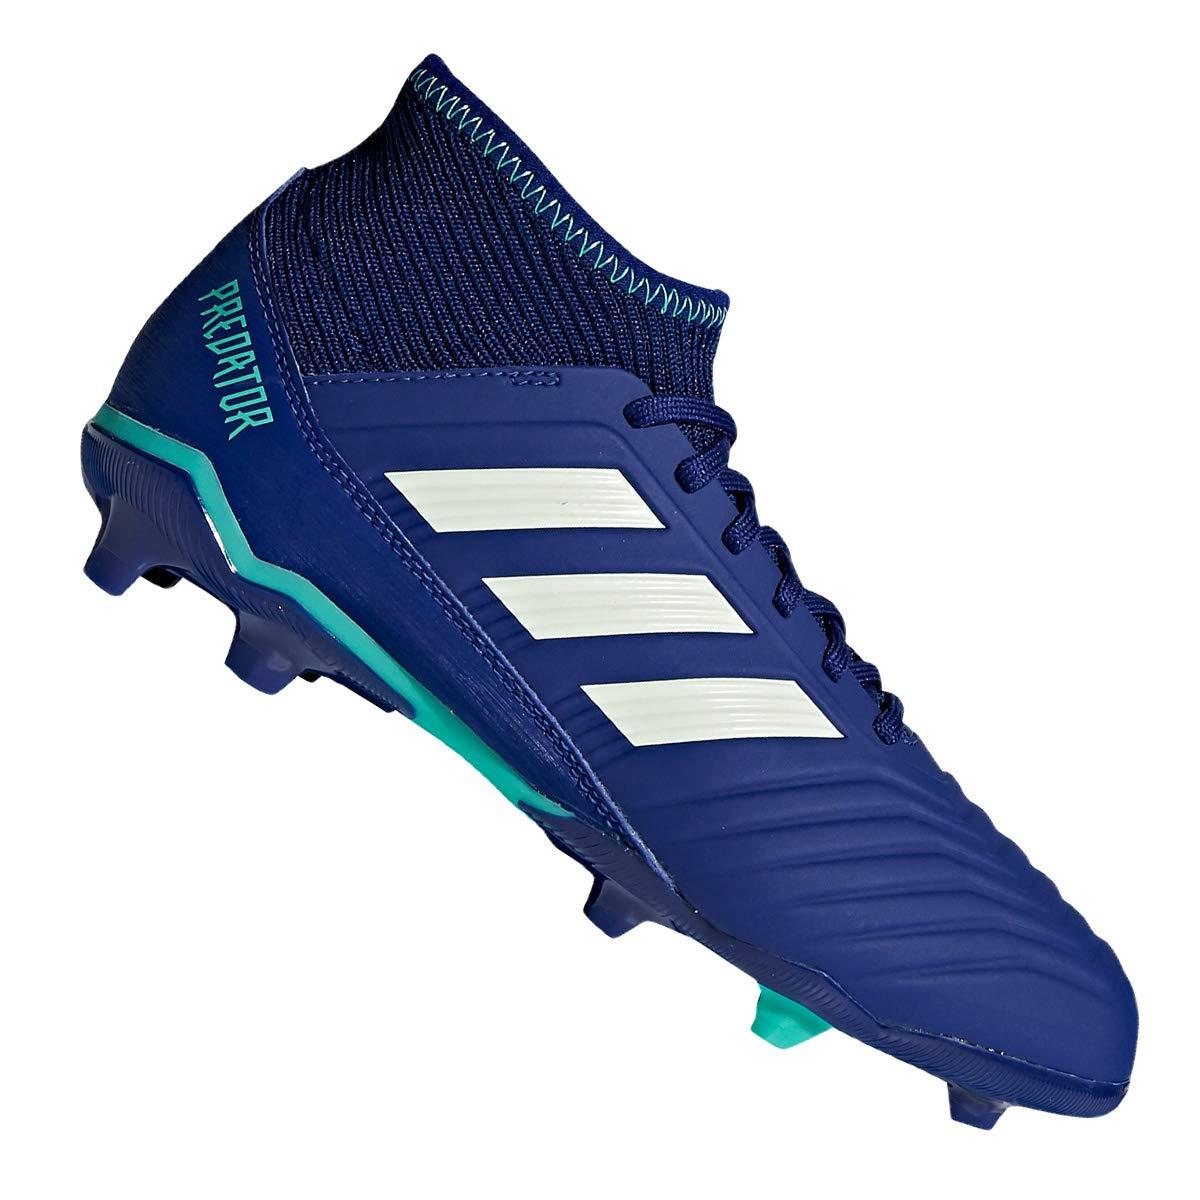 Adidas Predator 18.3 FG J, Zapatillas de Fú tbol para Niñ os Zapatillas de Fútbol para Niños